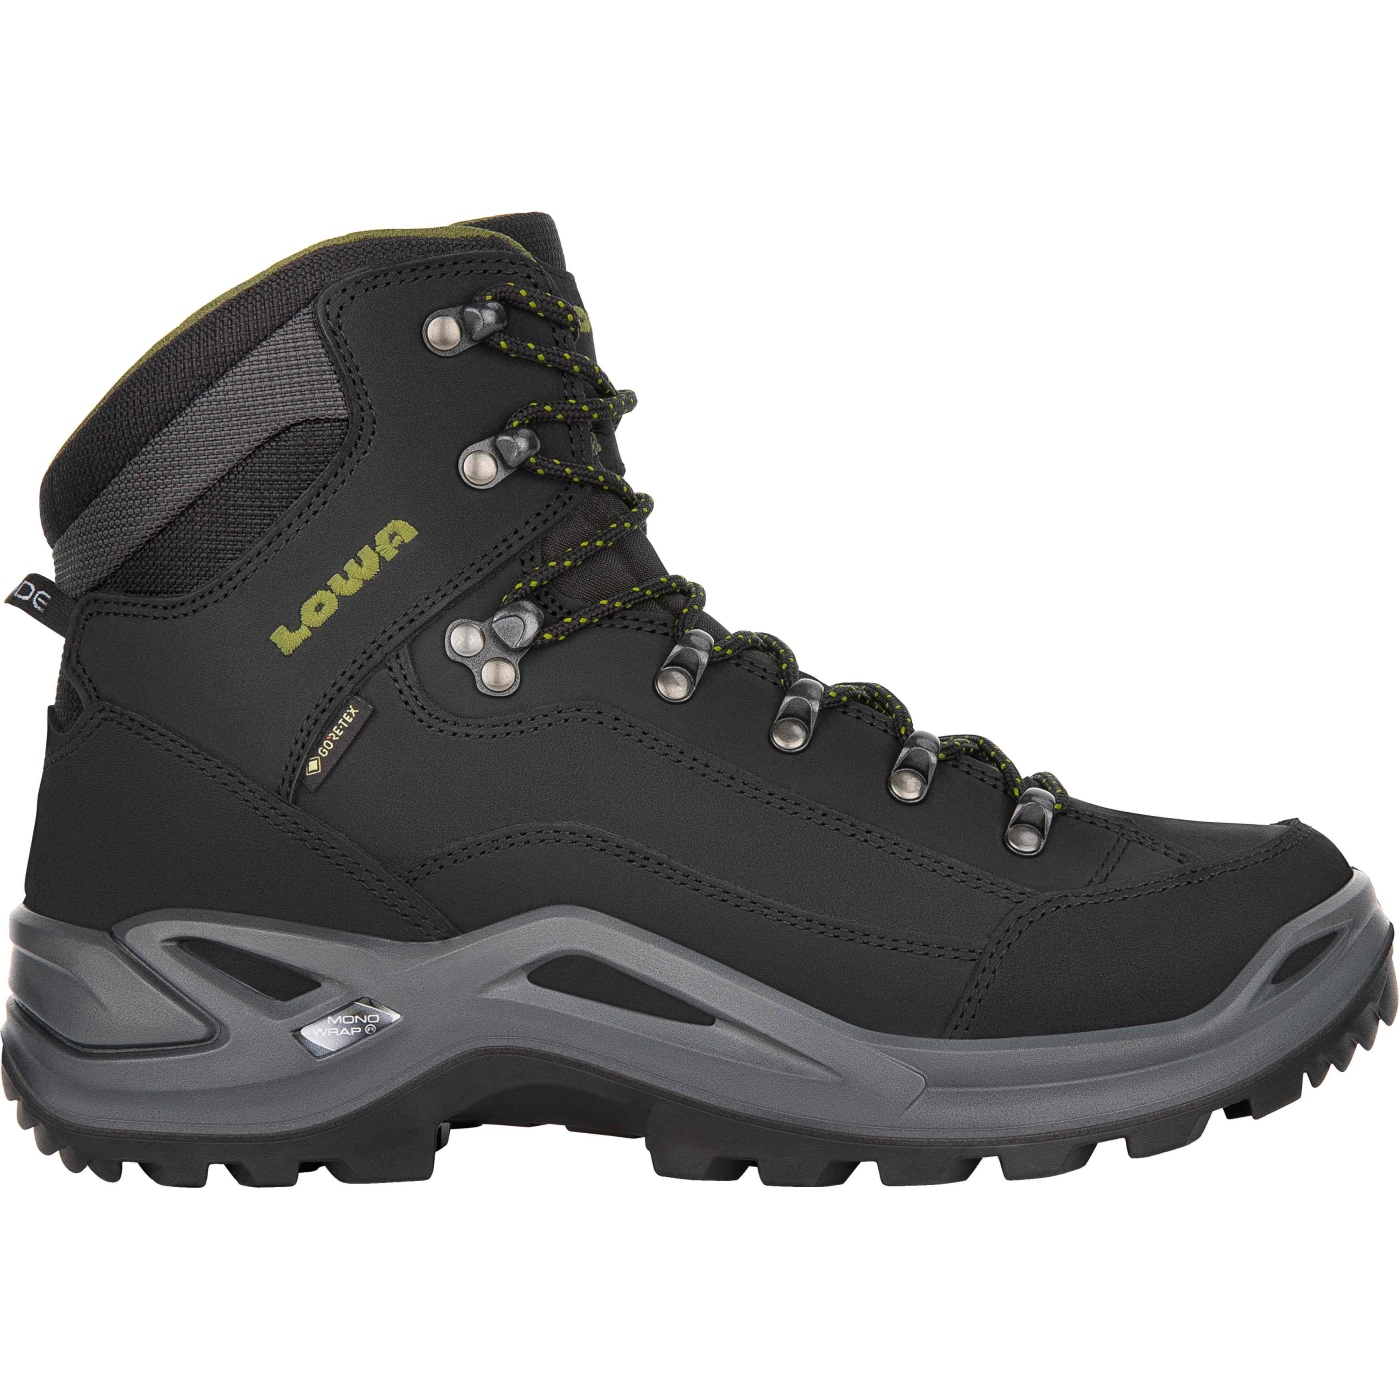 LOWA Renegade GTX Mid Shoe - black/oliv